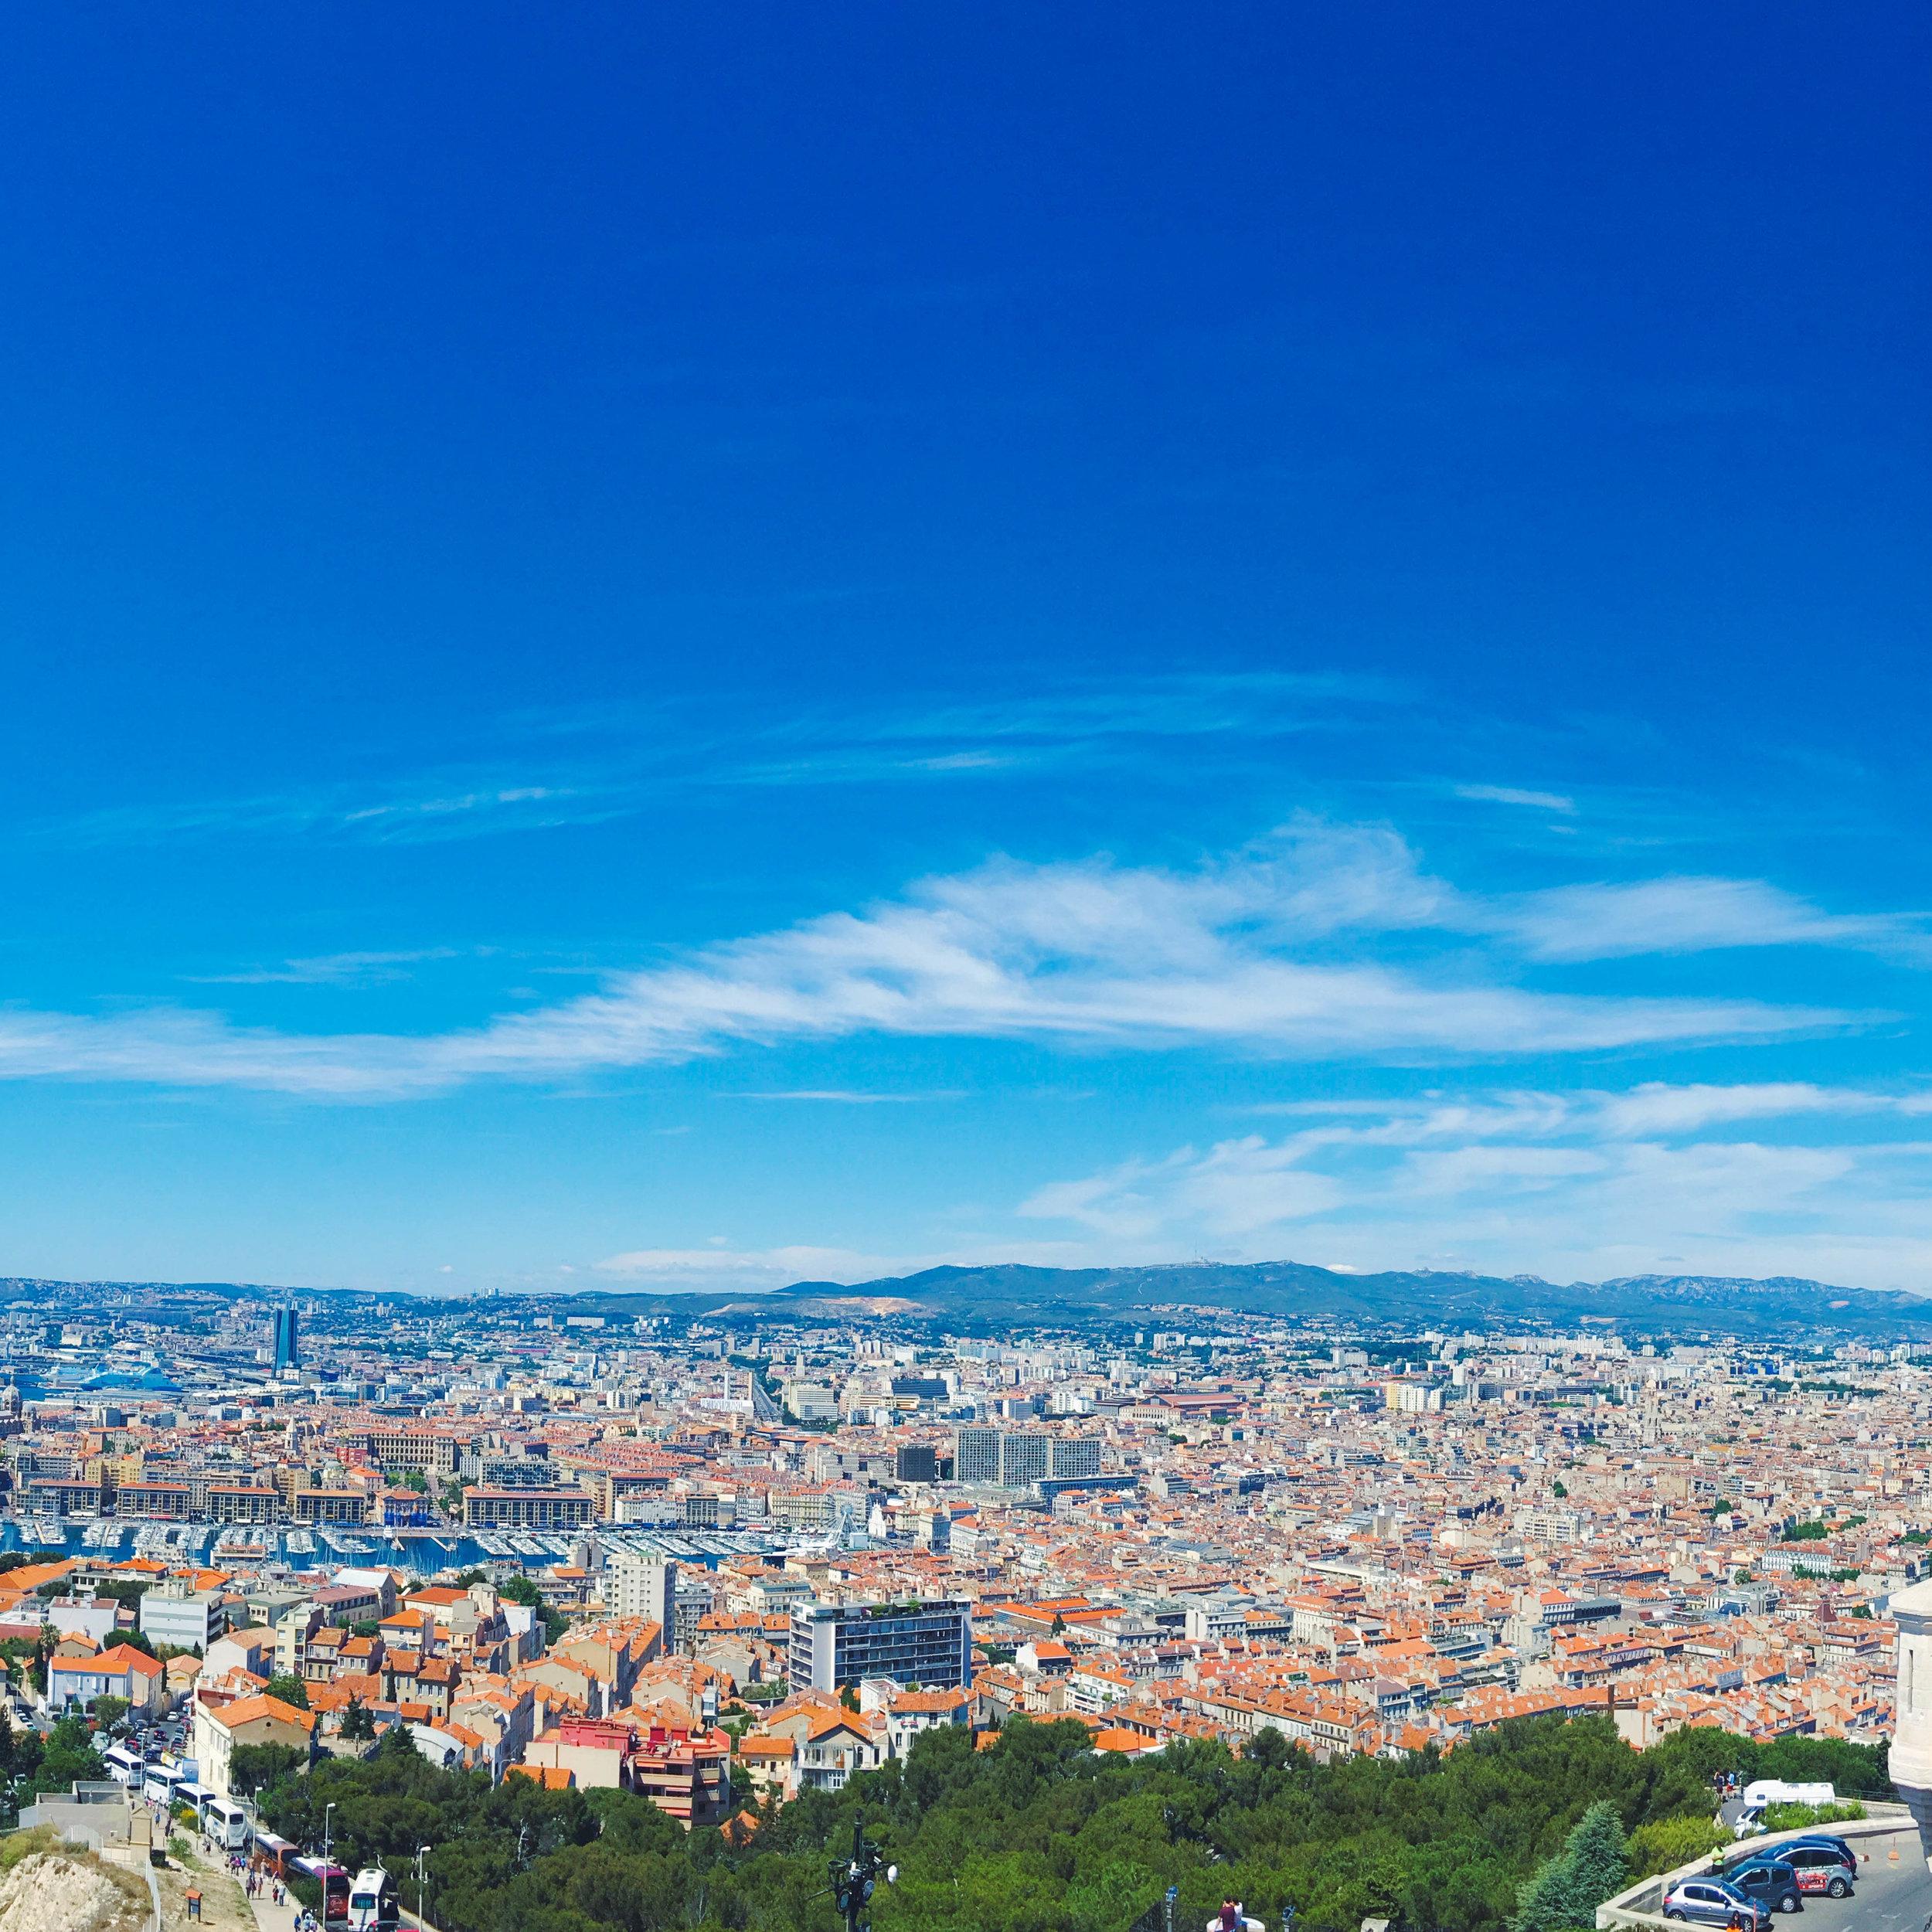 View over Marseille, France #mfrancisdesigntravels